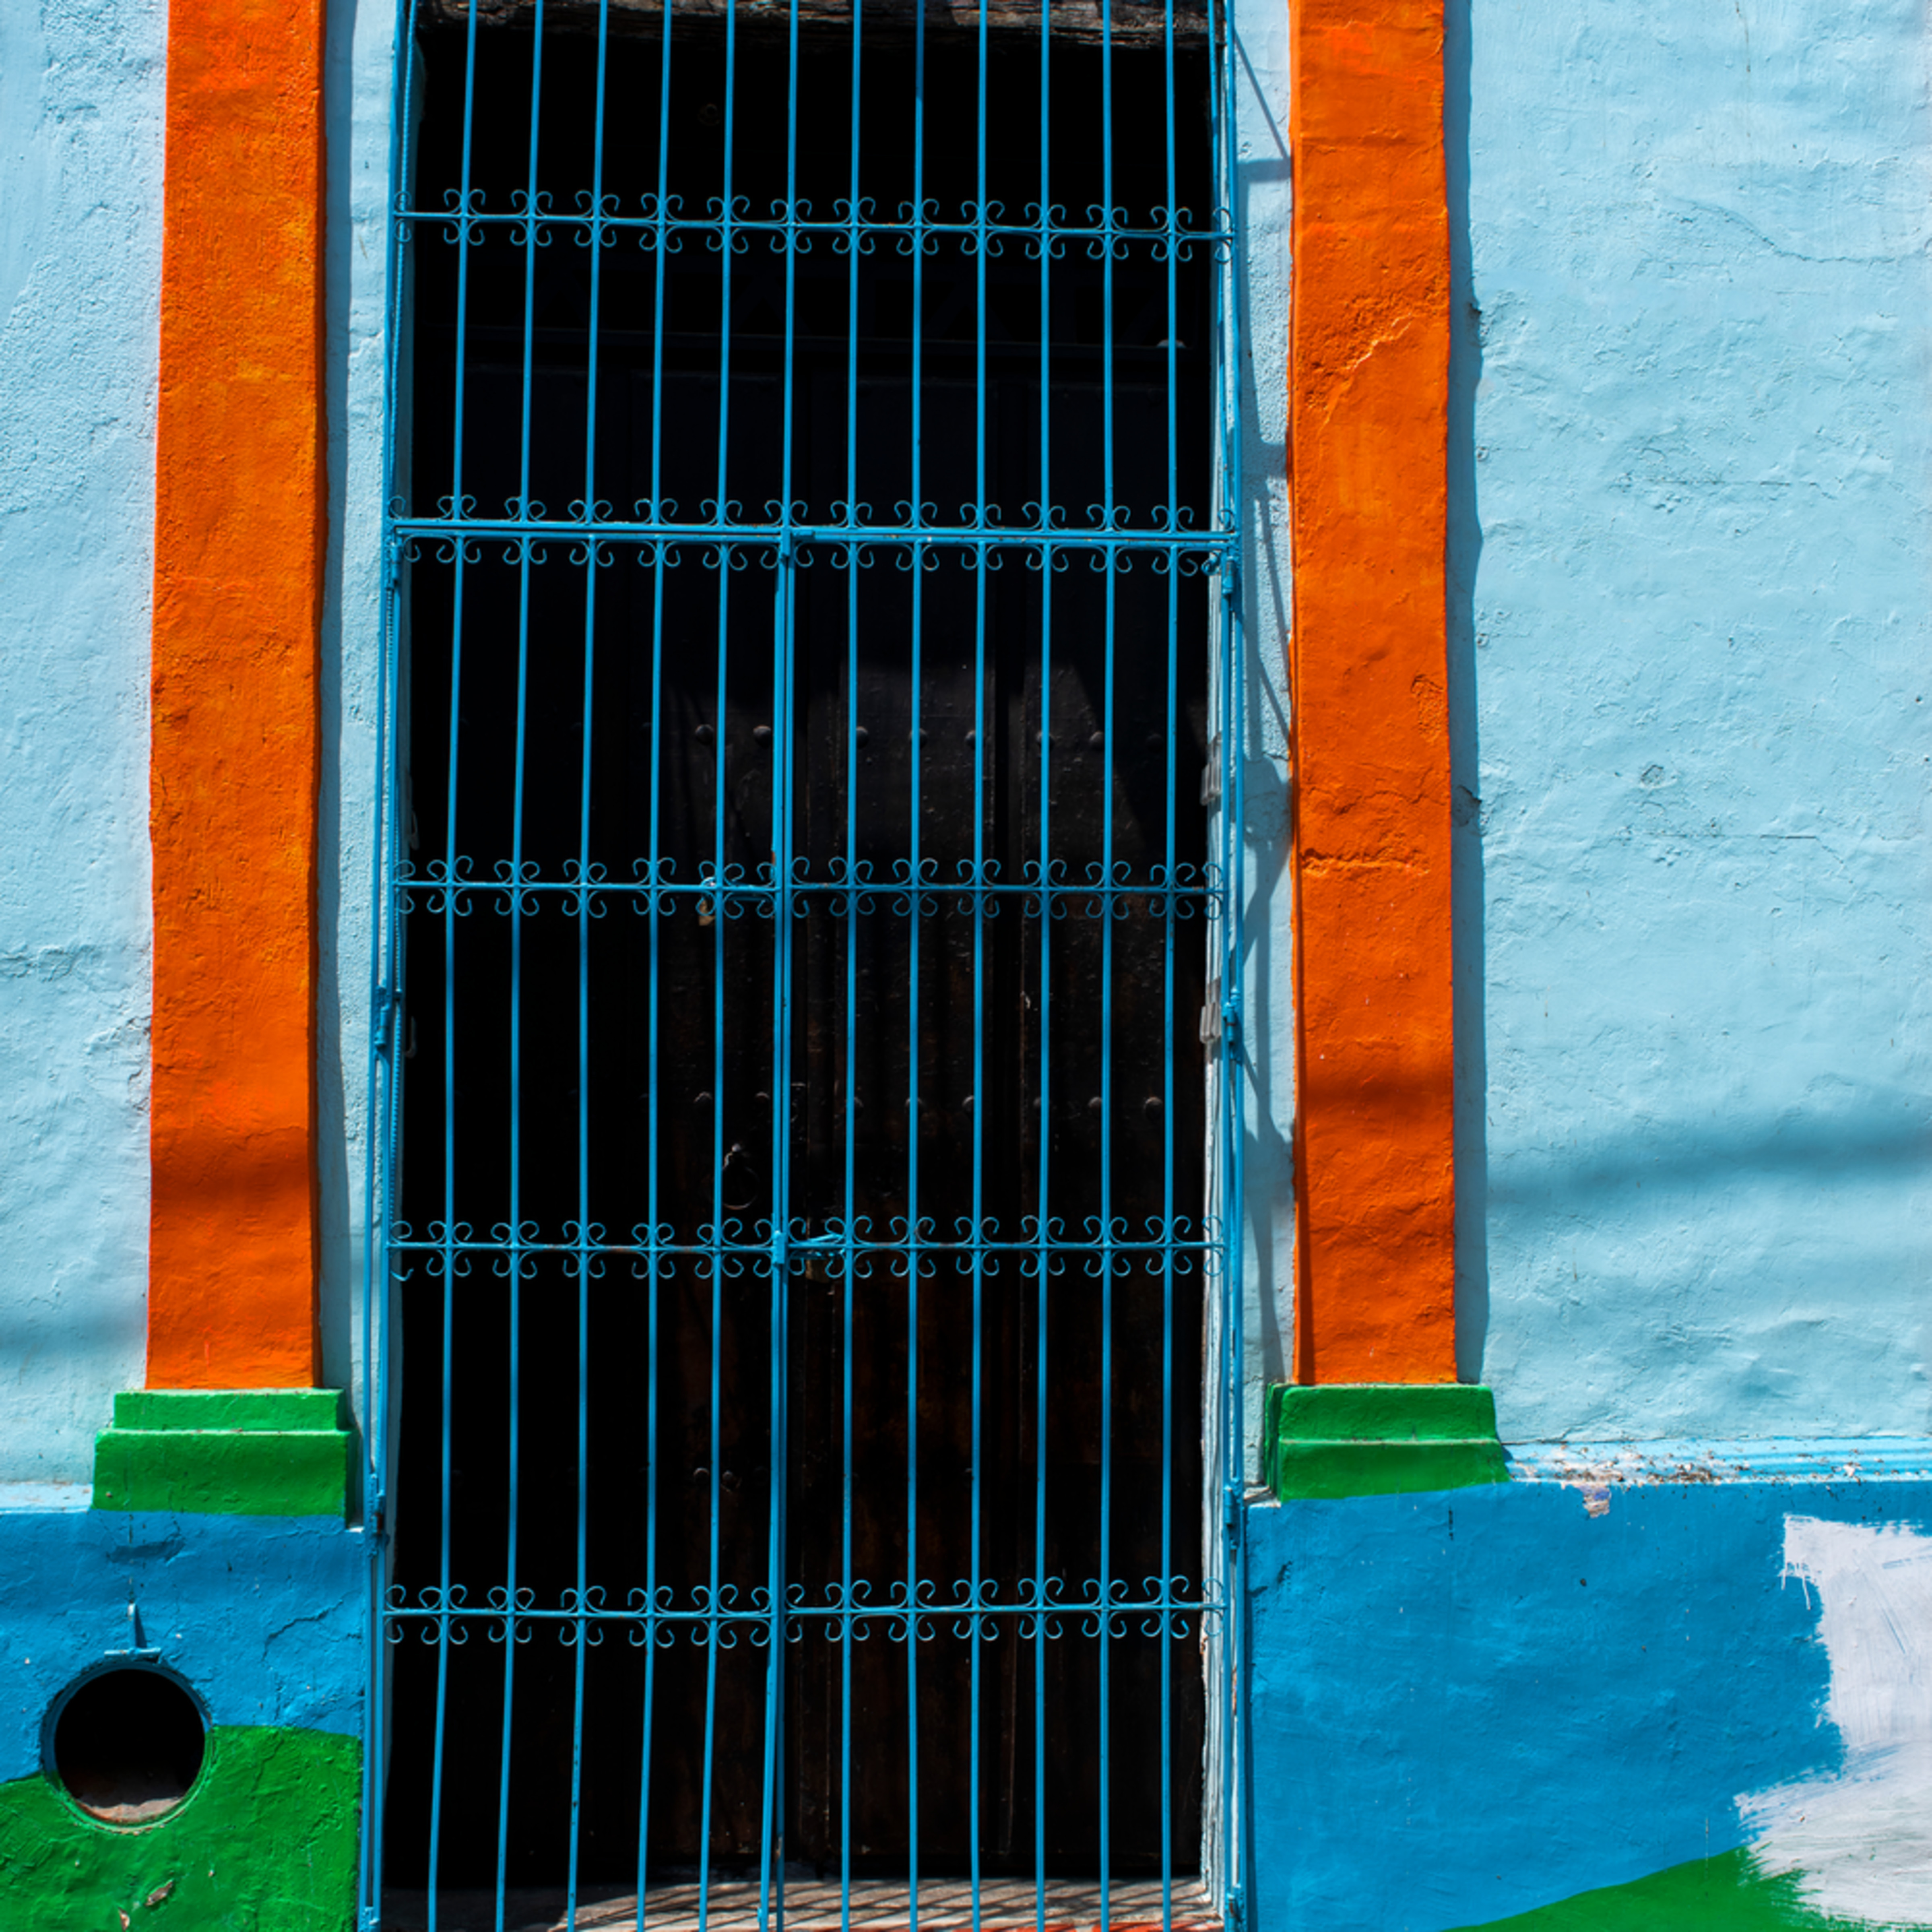 Dp616 santa marta blue door u5yrm6